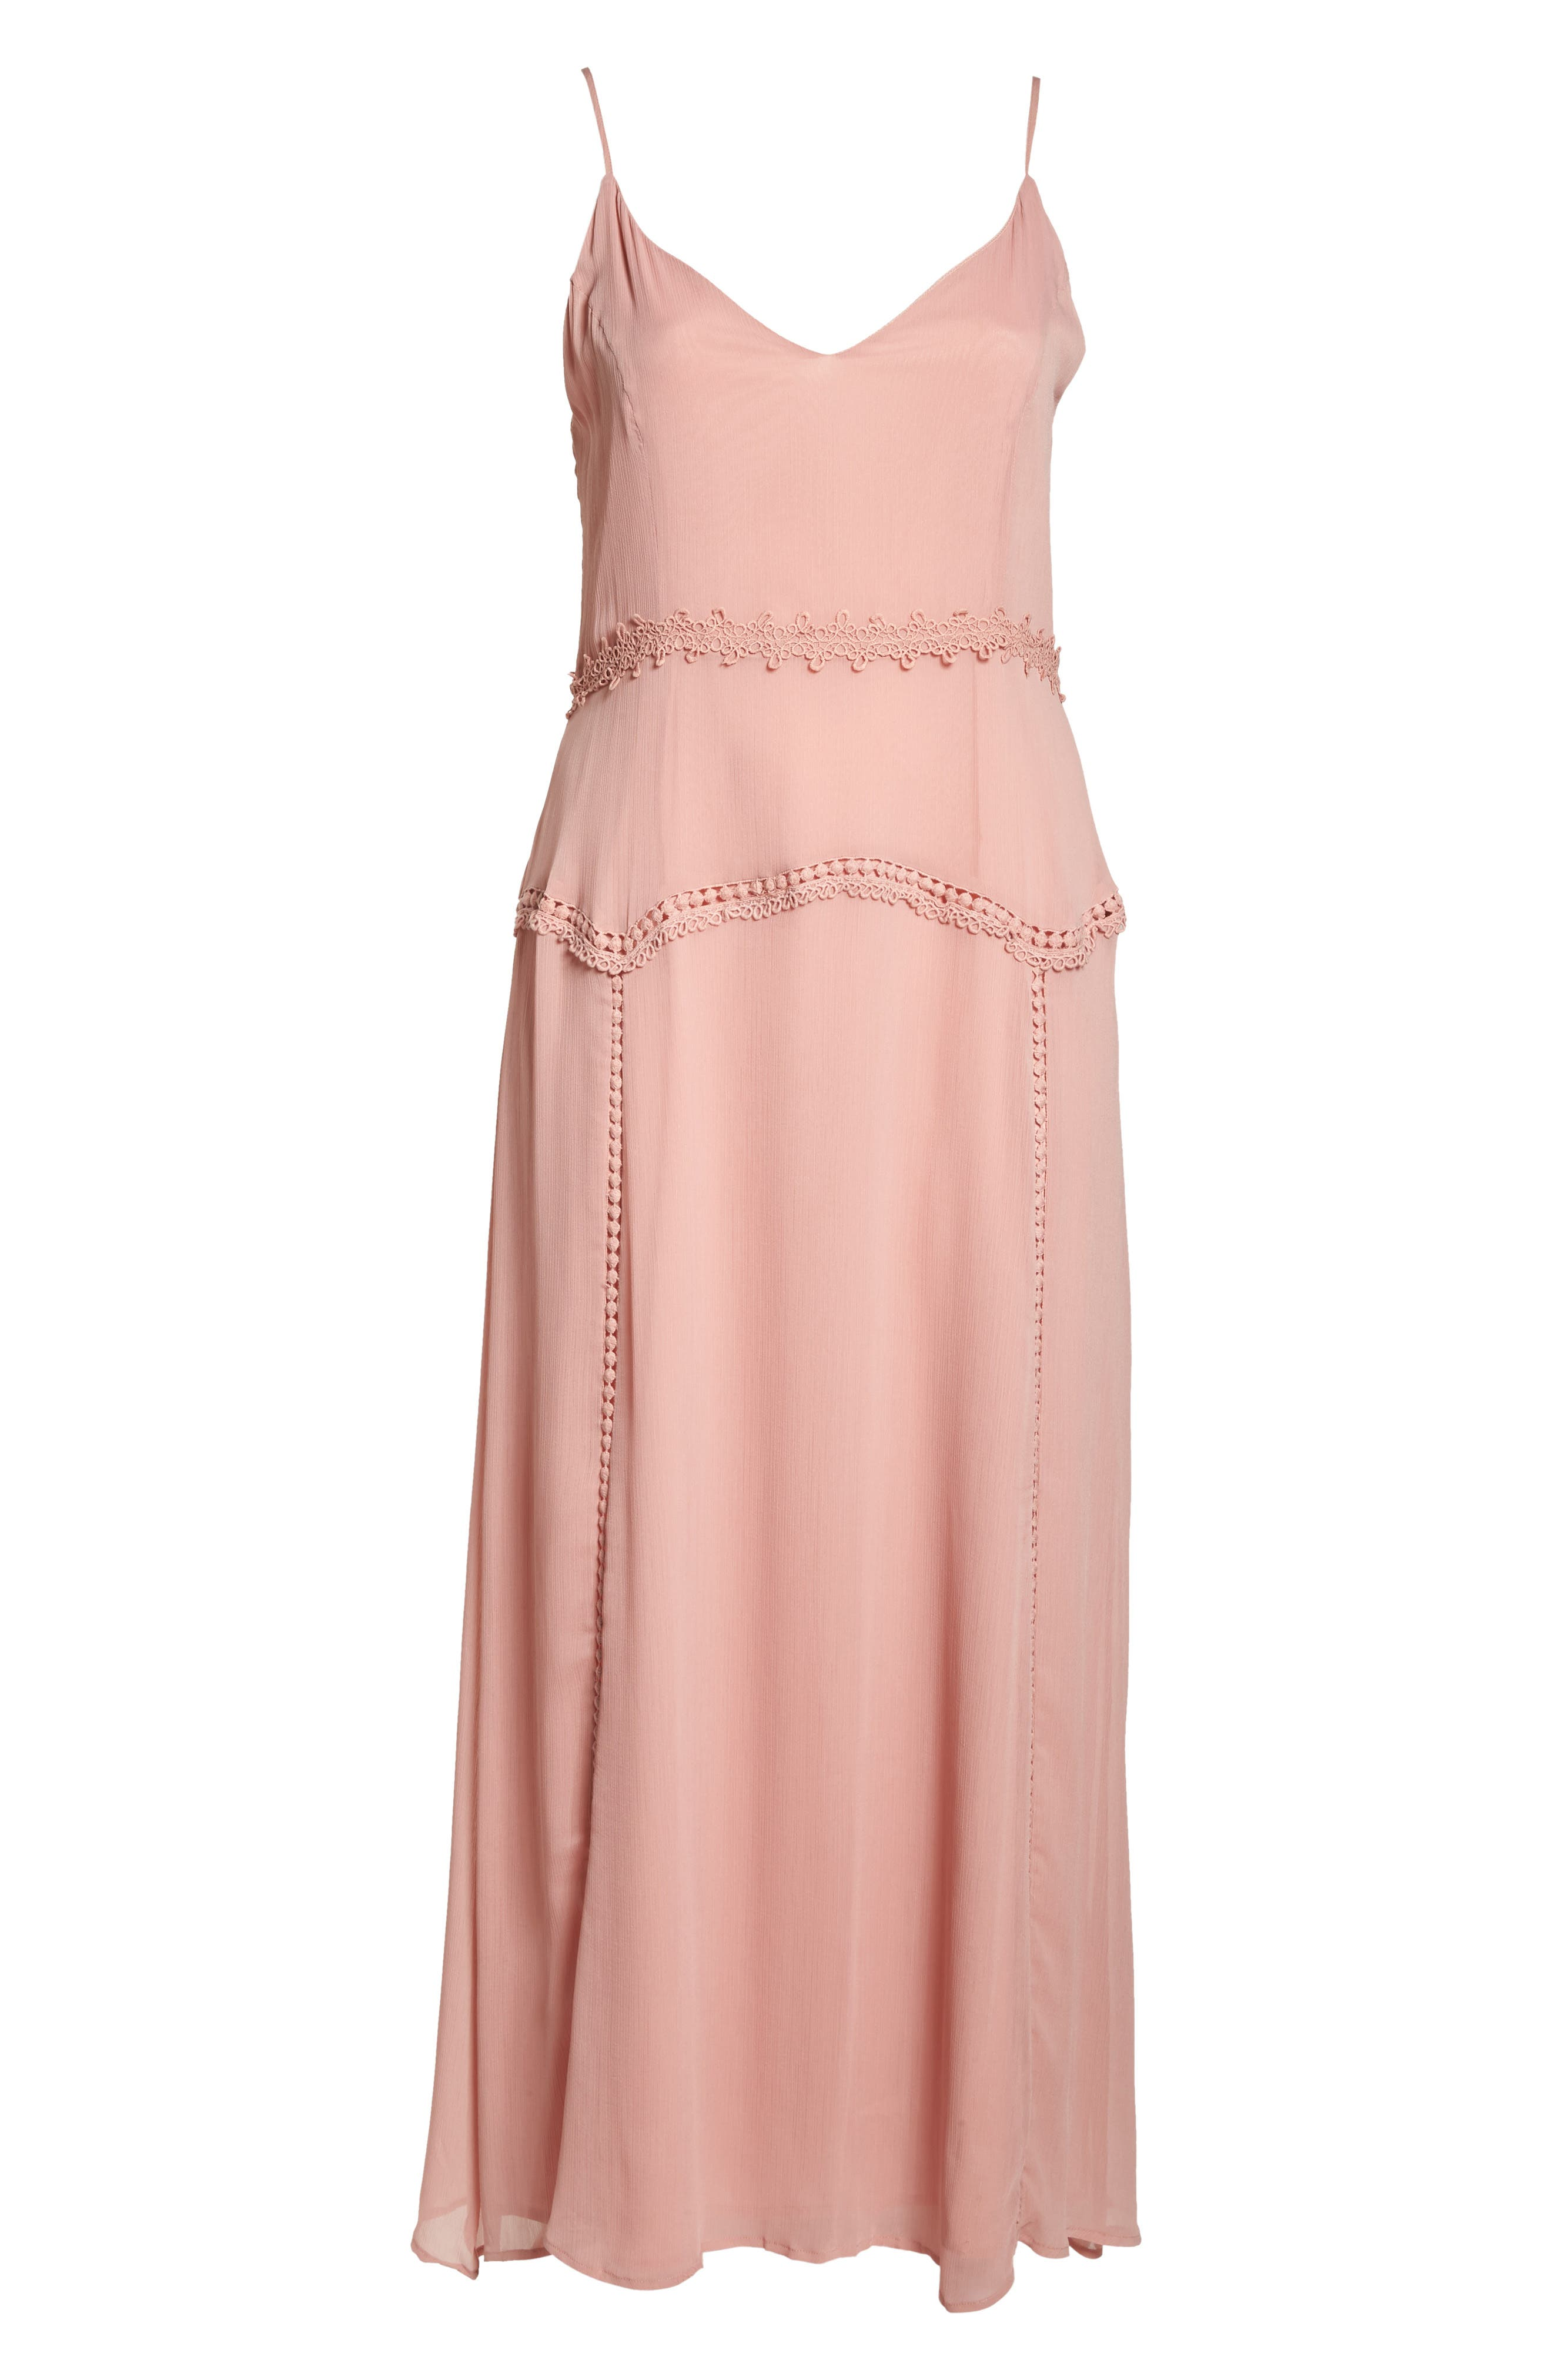 Picot Trim Maxi Dress,                             Alternate thumbnail 7, color,                             650